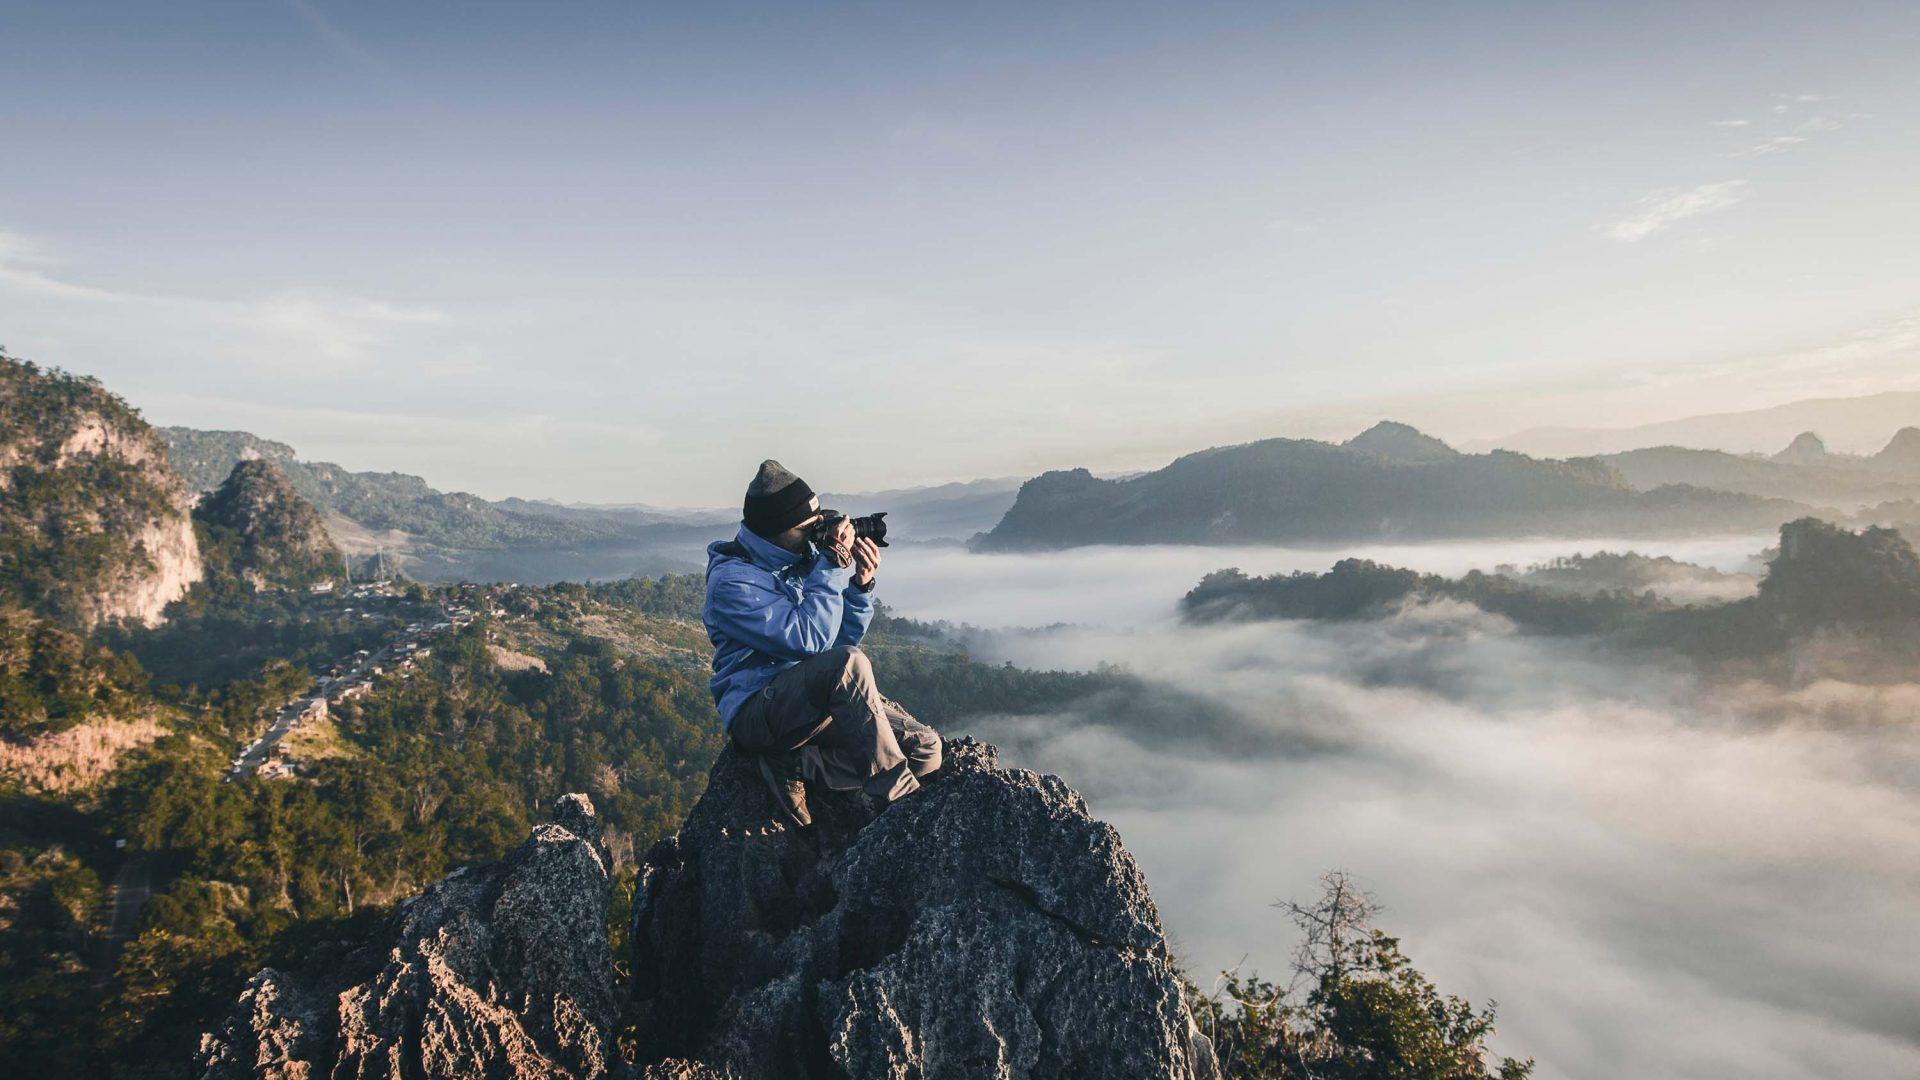 A man takes a photograph at Baan Ja Bo, Mae Hong Son, Thailand.